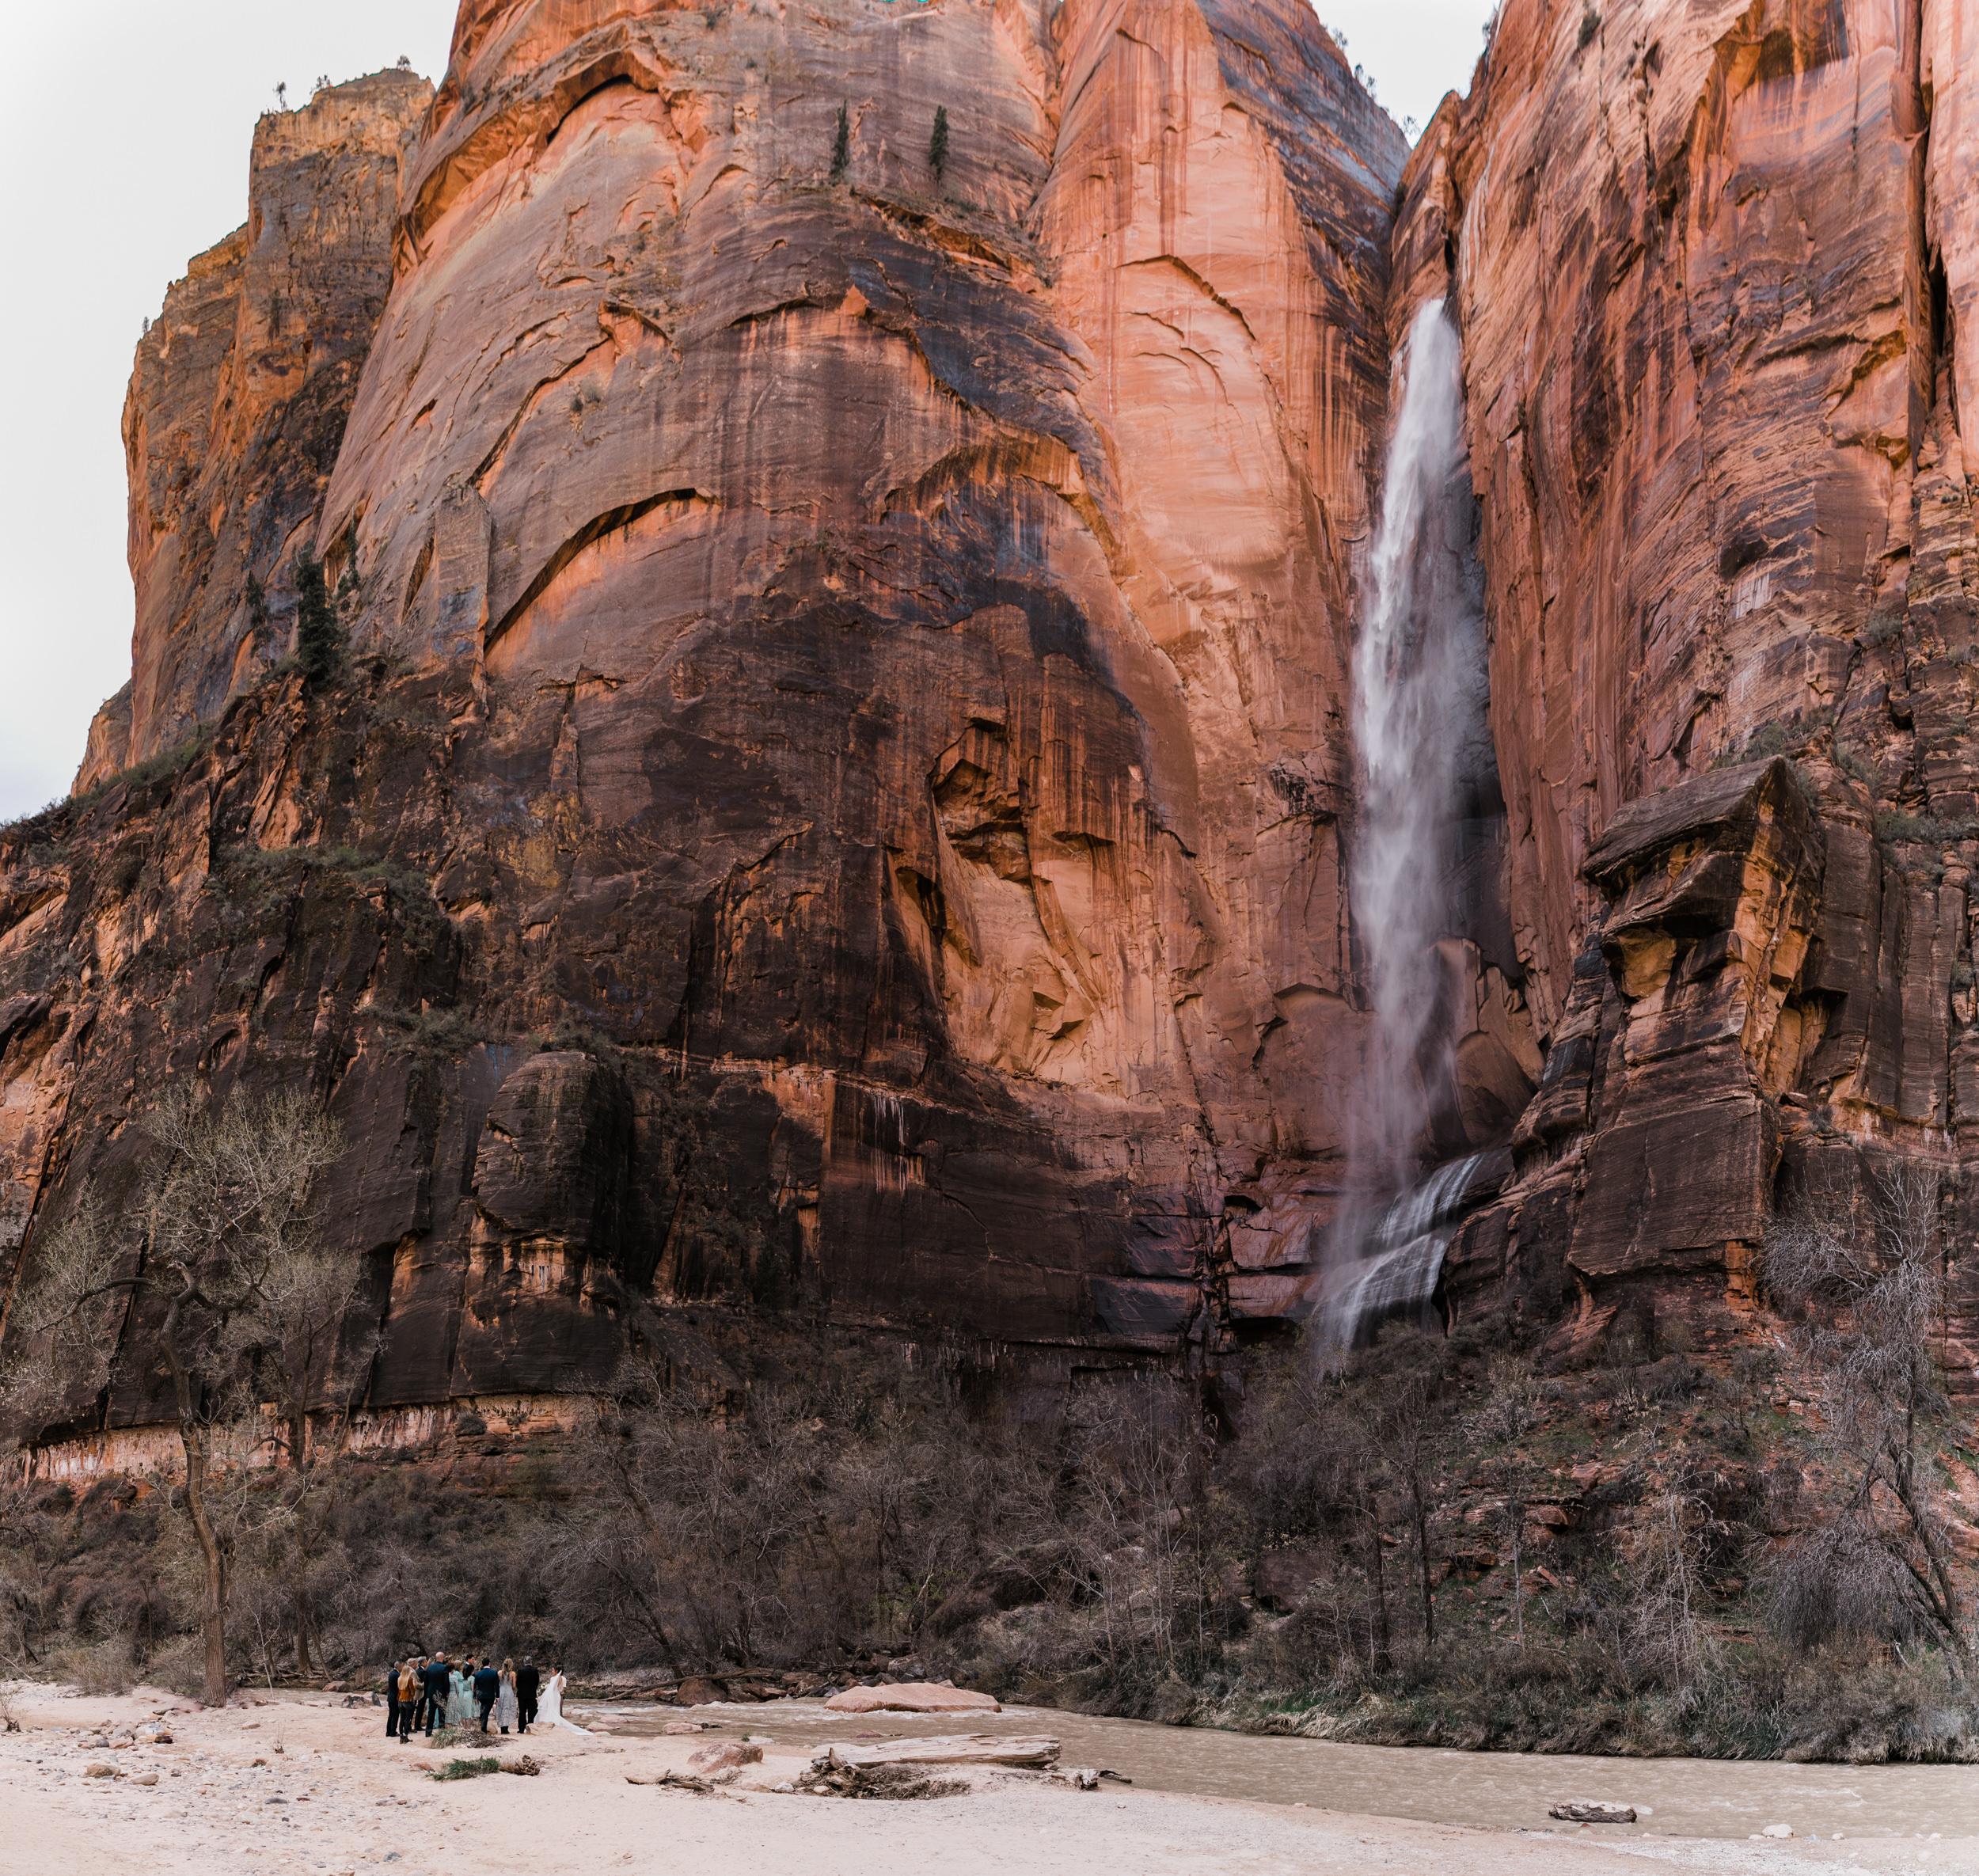 Zion-National-Park-Adventure-Wedding-Hearnes-Elopement-Photography-10.jpg